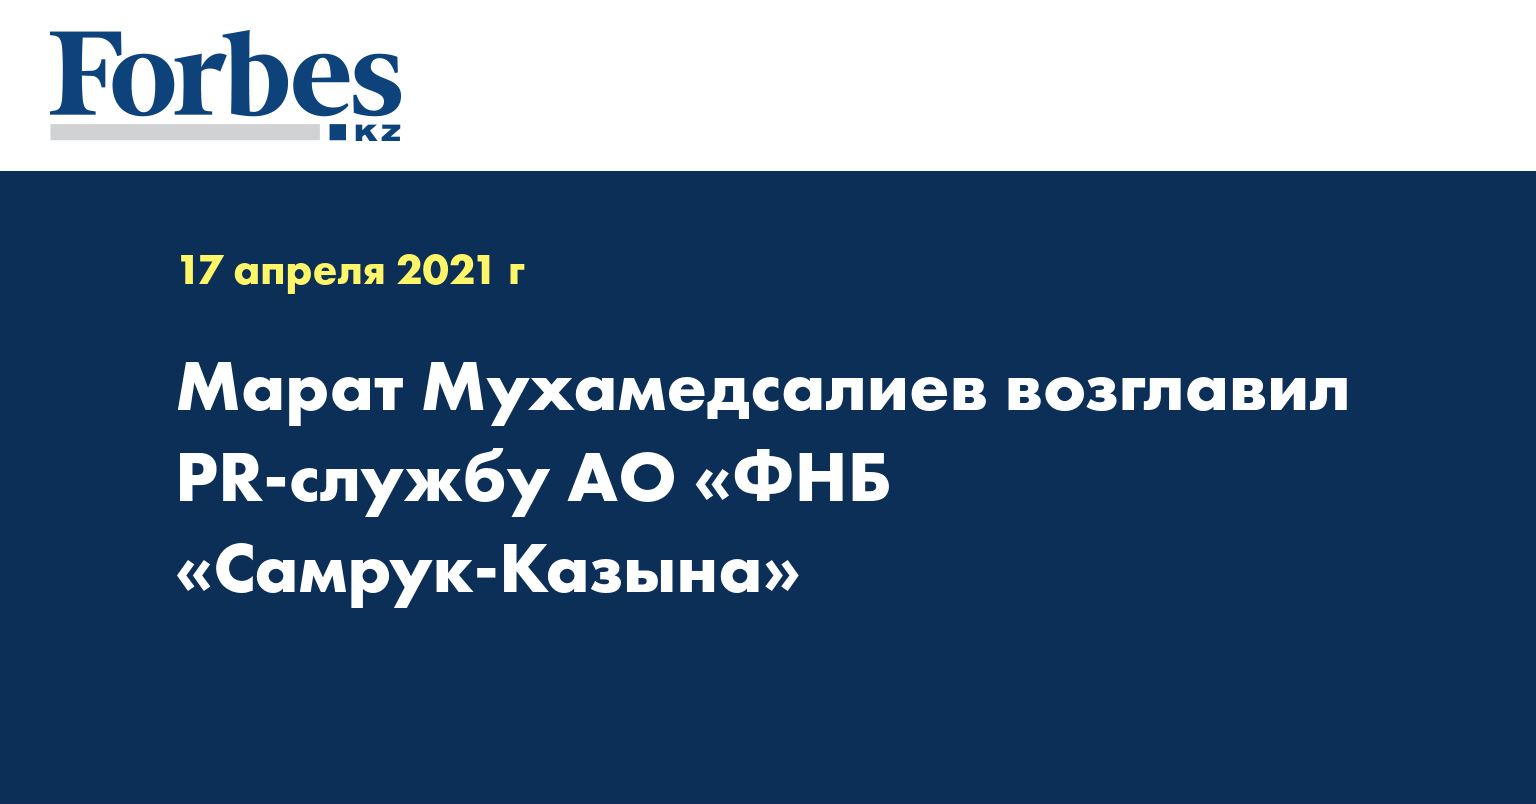 Марат Мухамедсалиев возглавил PR-службу АО «ФНБ «Самрук-Казына»